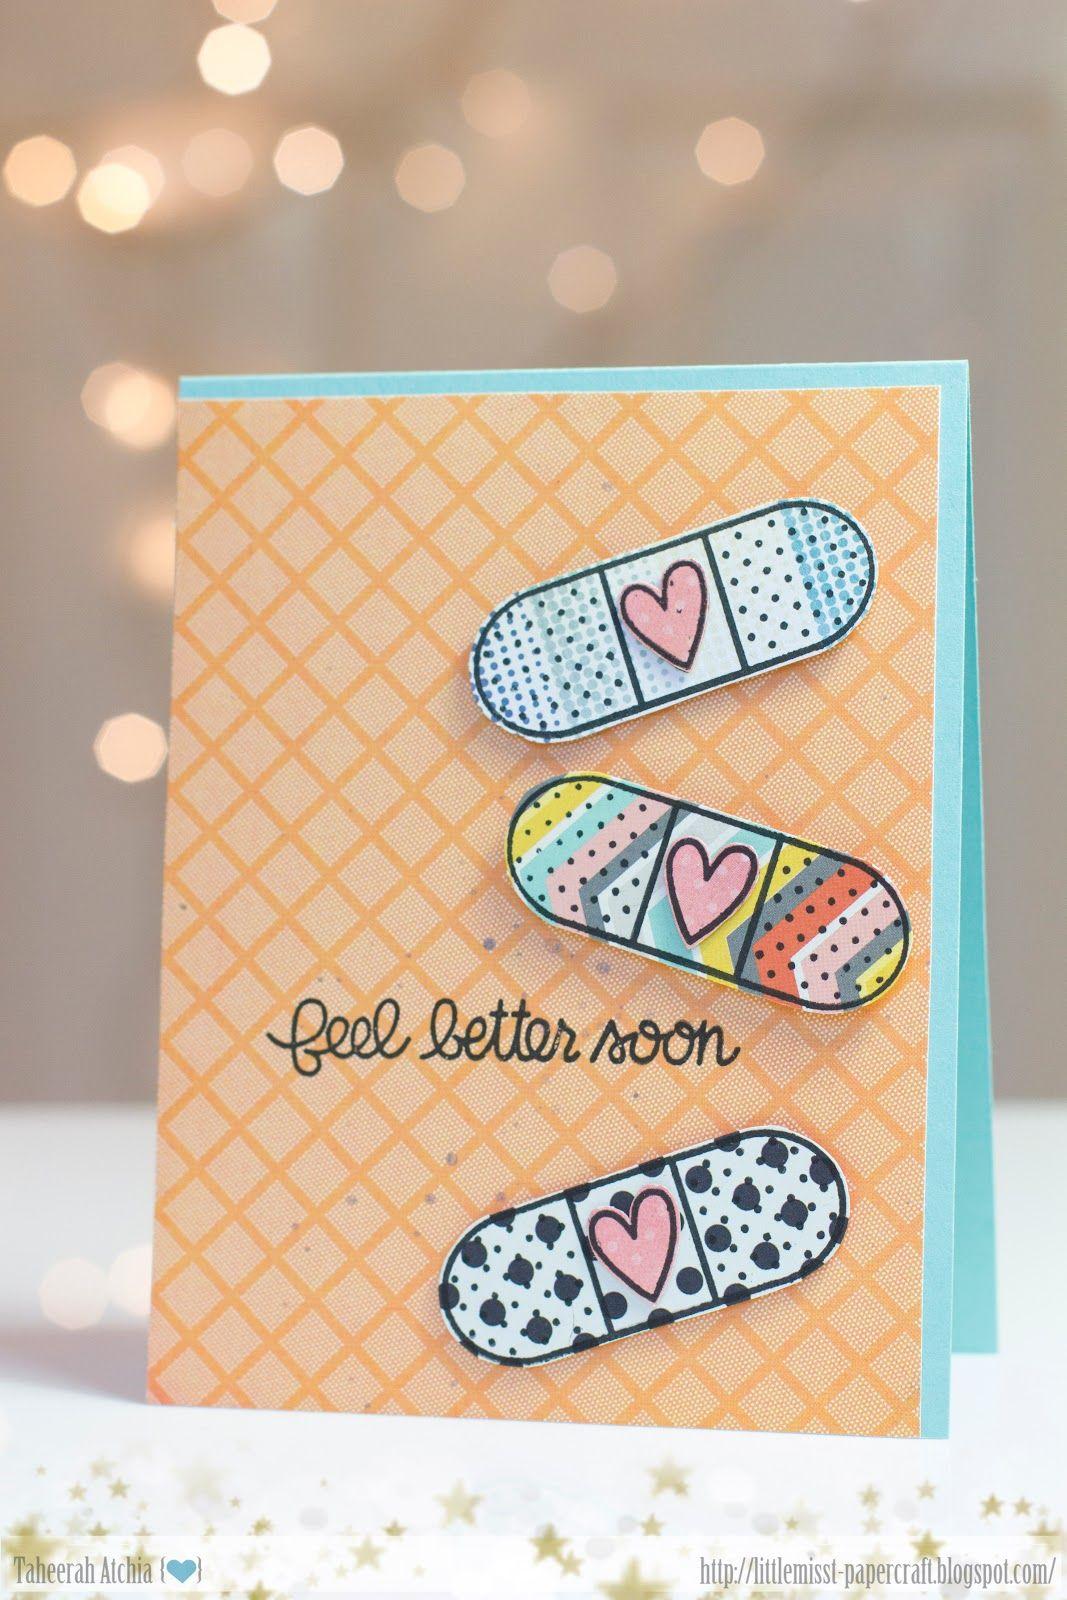 Season's Givings Blog Hop! - *Made With {♥} by Taheerah Atchia* :- http://littlemisst-papercraft.blogspot.com/